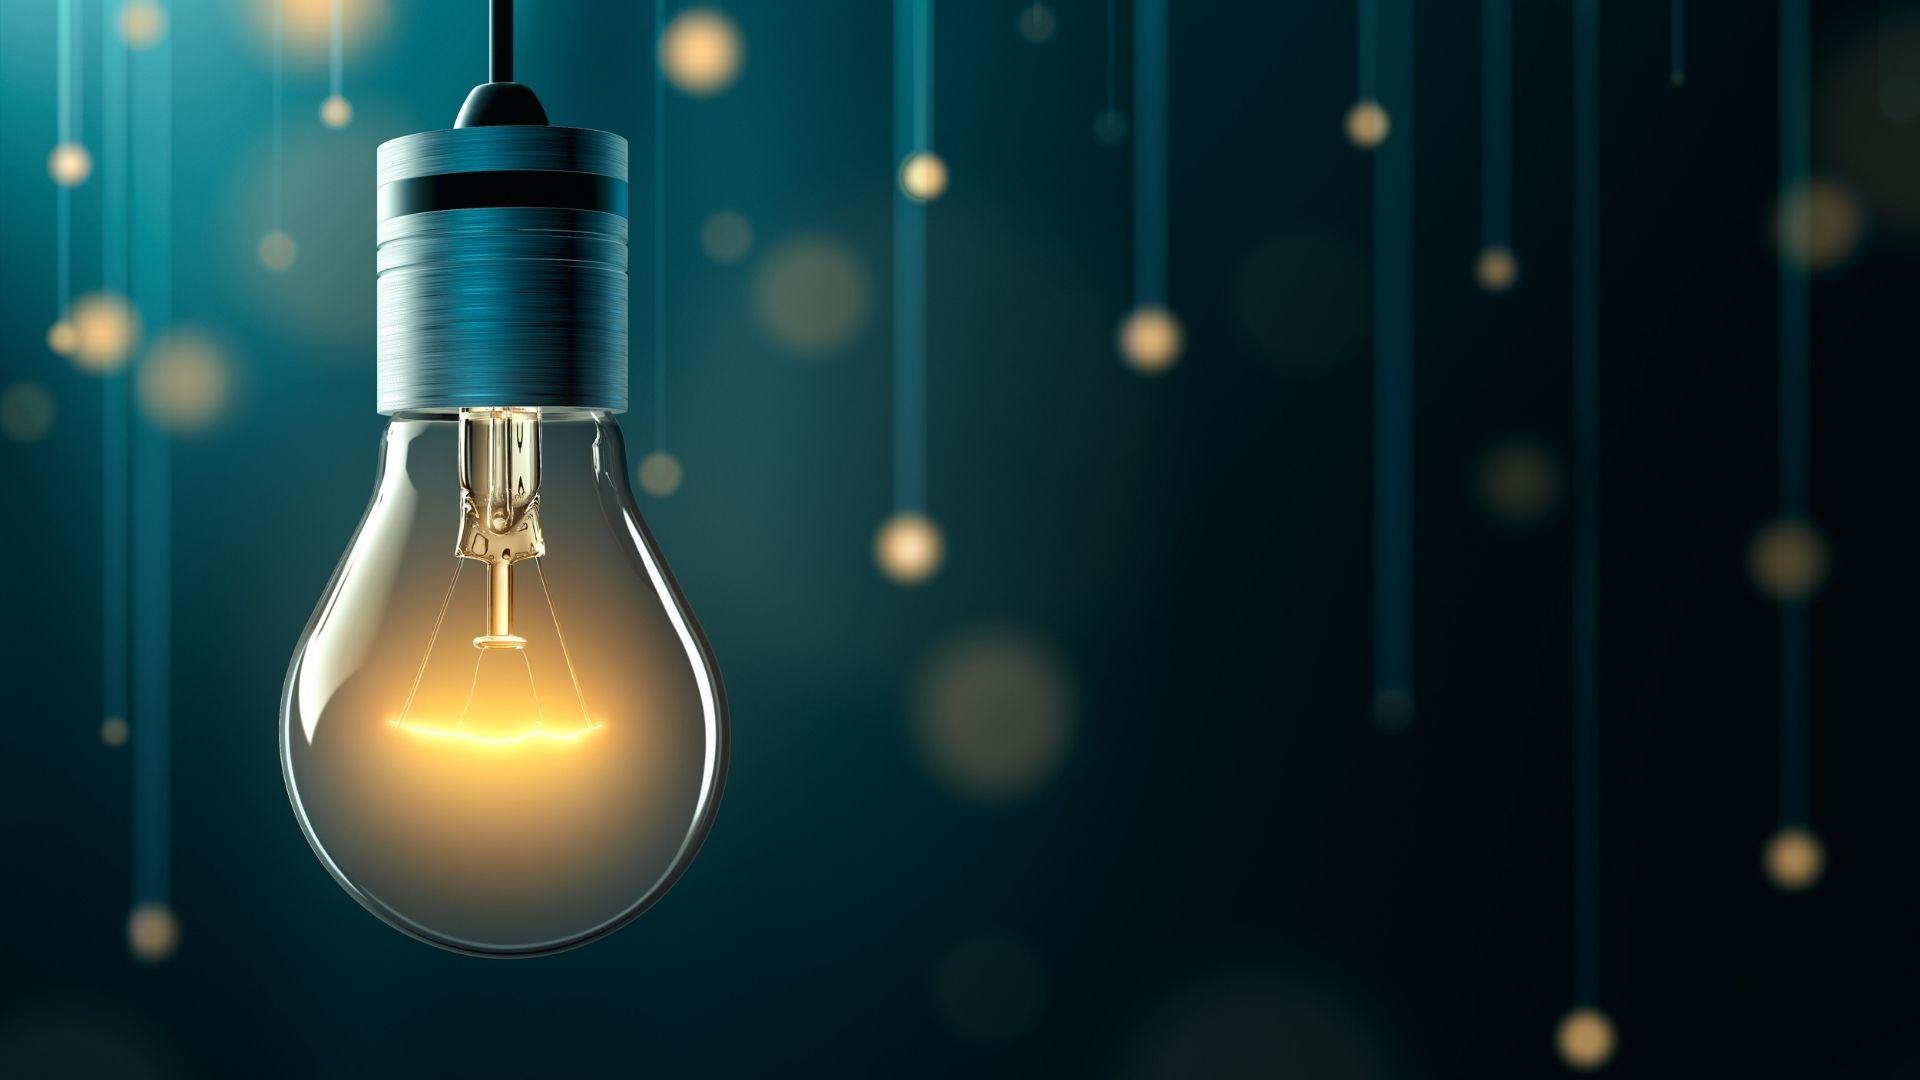 Business Transfromation Lightbulb Idea